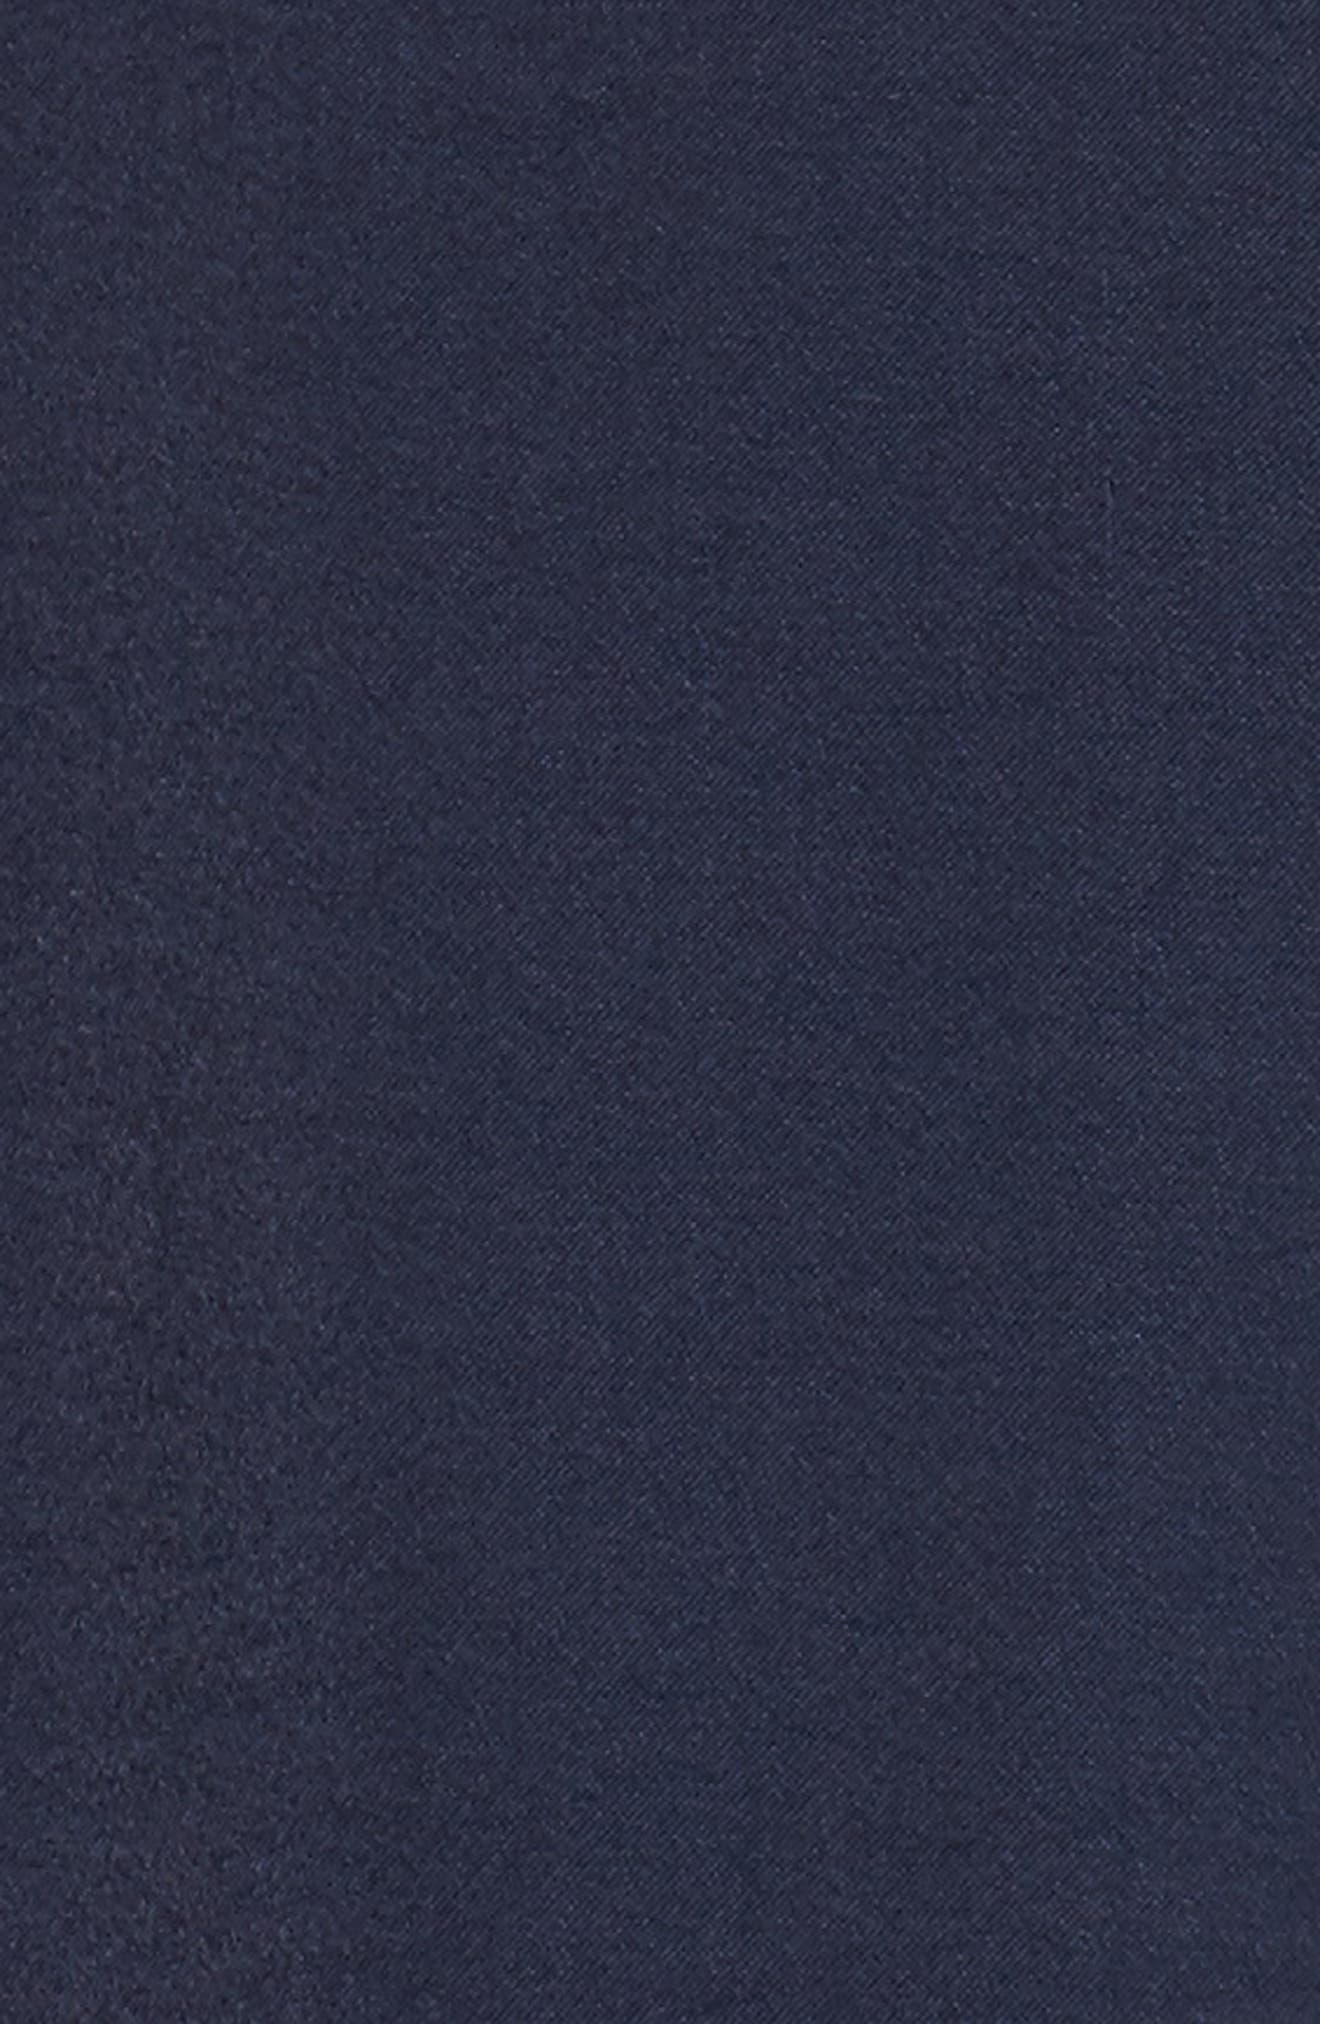 Cold Shoulder Midi Dress,                             Alternate thumbnail 5, color,                             018